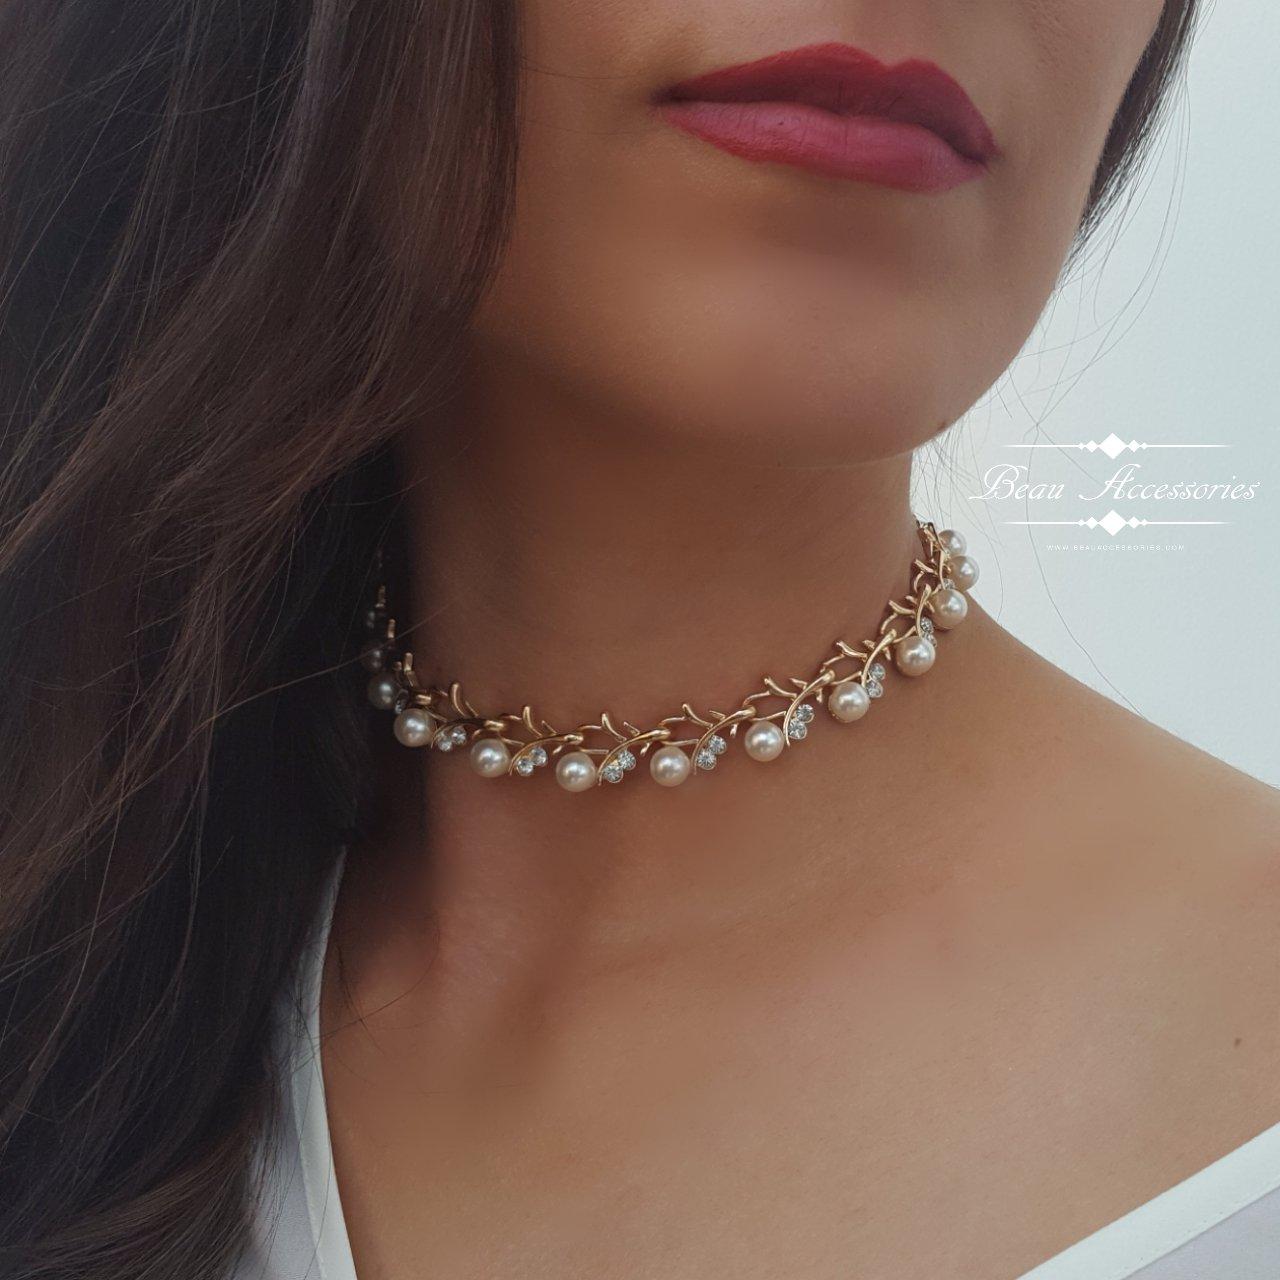 Image of Pearl & Rhinestone Choker Necklace